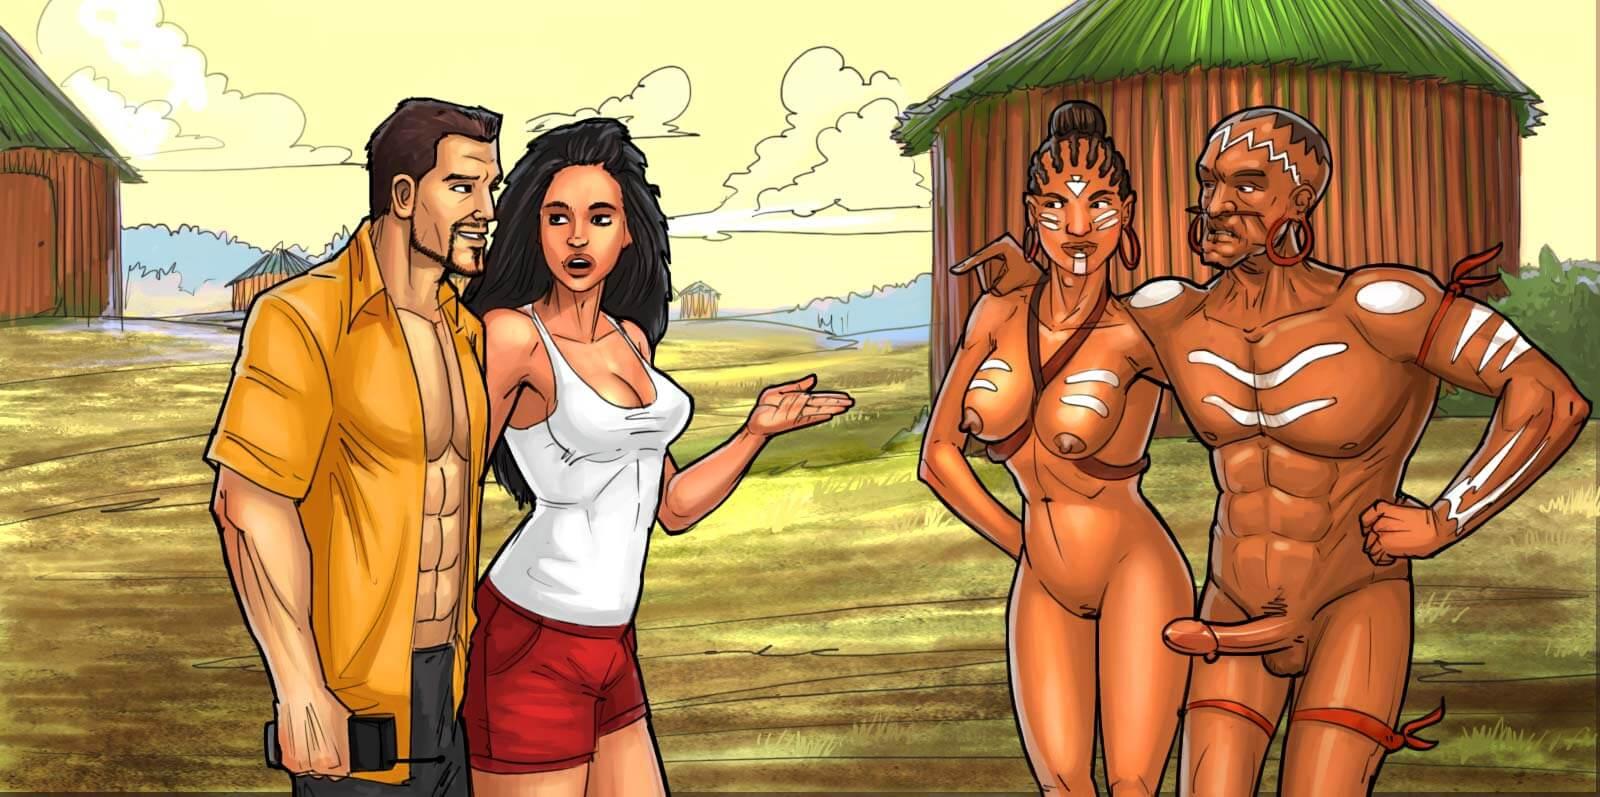 Naughty Games Naked Women